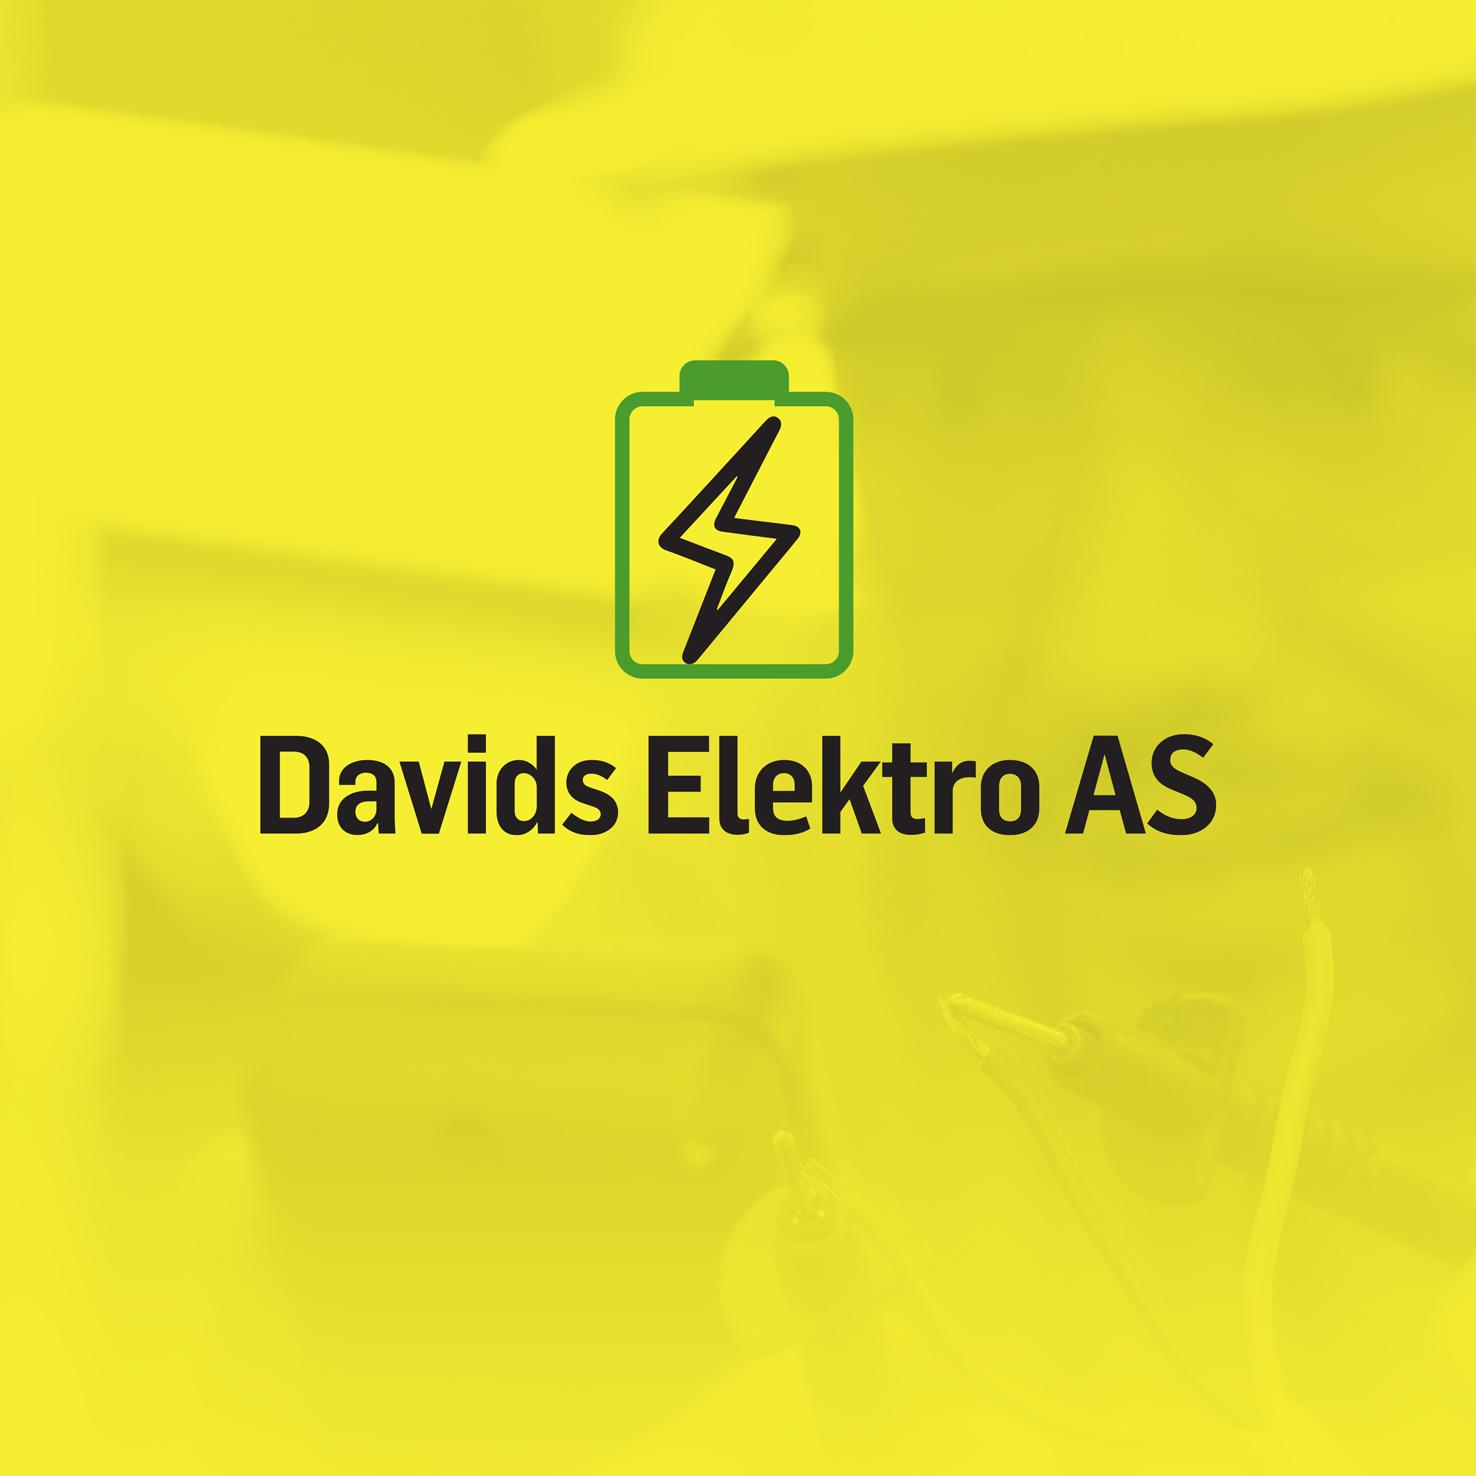 Davids Elektro AS